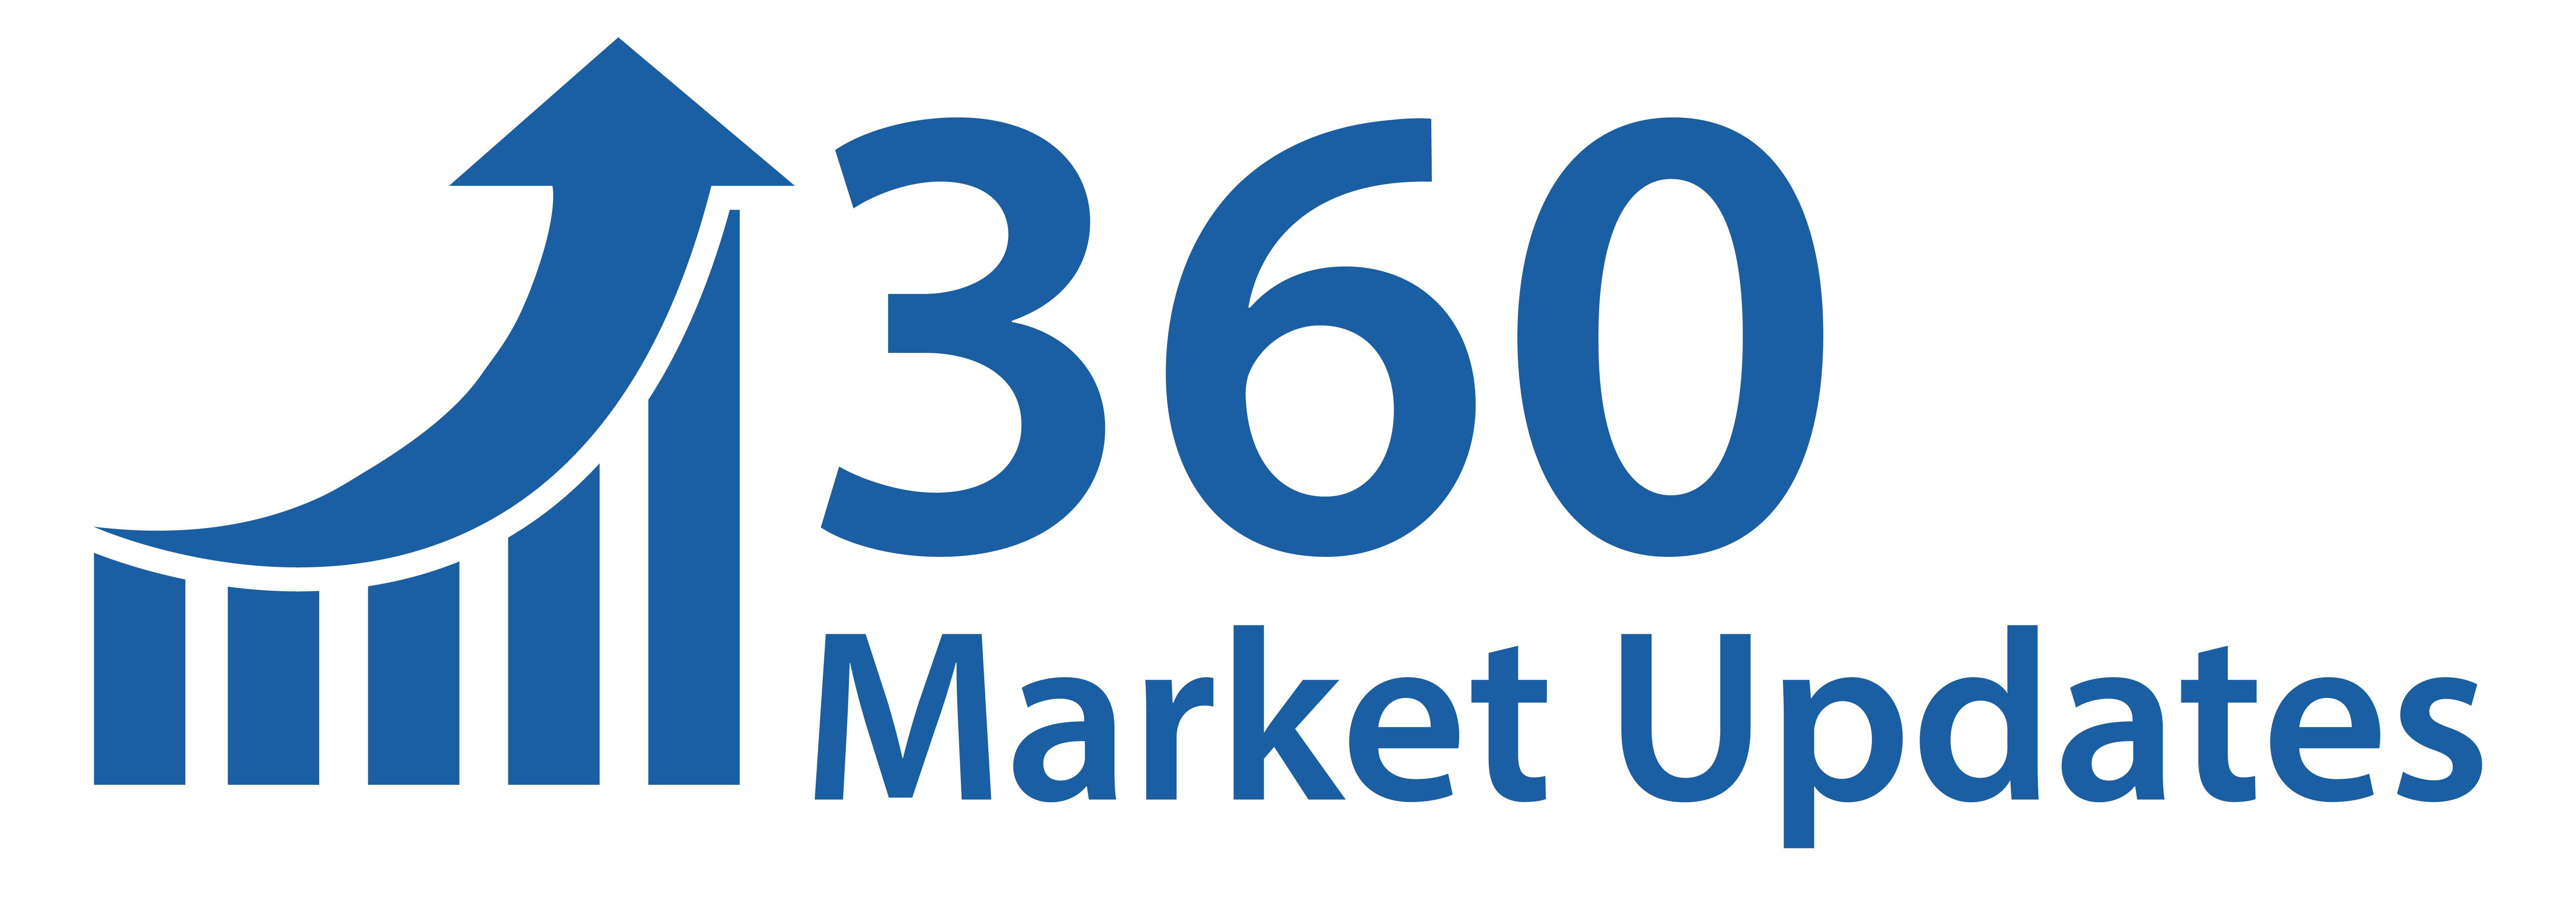 Uterine Manipulators Market in Health Care Equipment & Services,Health Care Equipment & Supplies,Health Care Equipment sector Expected To Grow At A CAGR of 5.39% For The Period 2020-2023